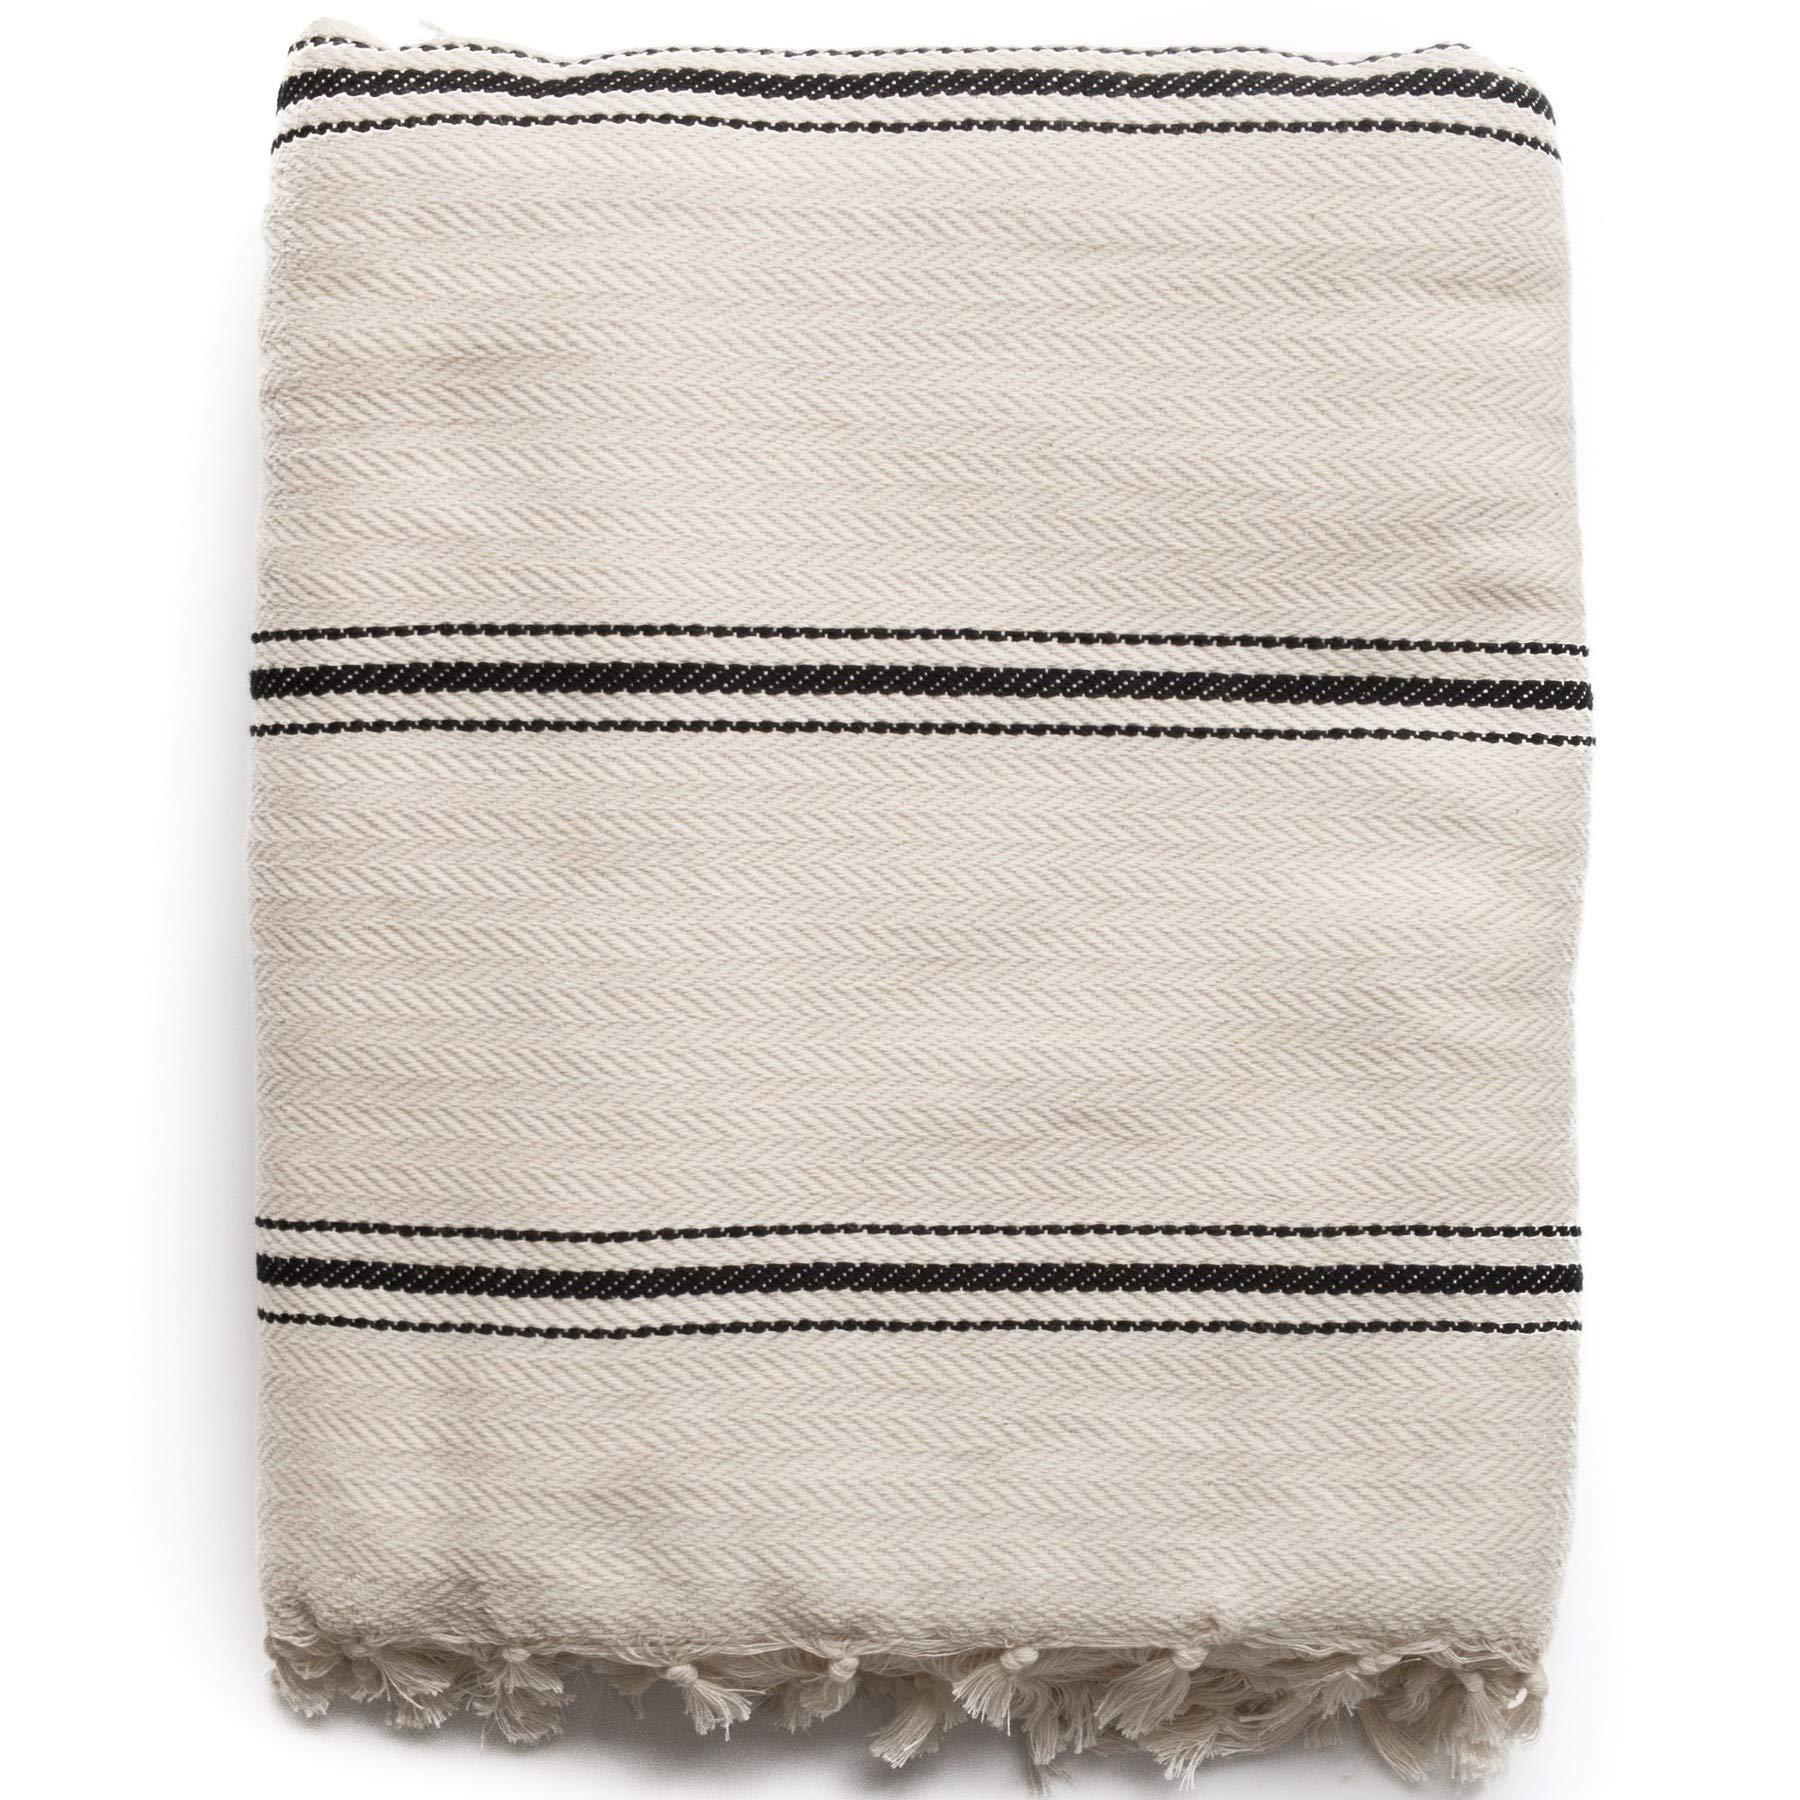 The Loomia Turkish Cotton Blanket - Sophie Boho Series (100% Cotton, 74'' X 82'' Full Size, Cream-Beige Black Stripes)